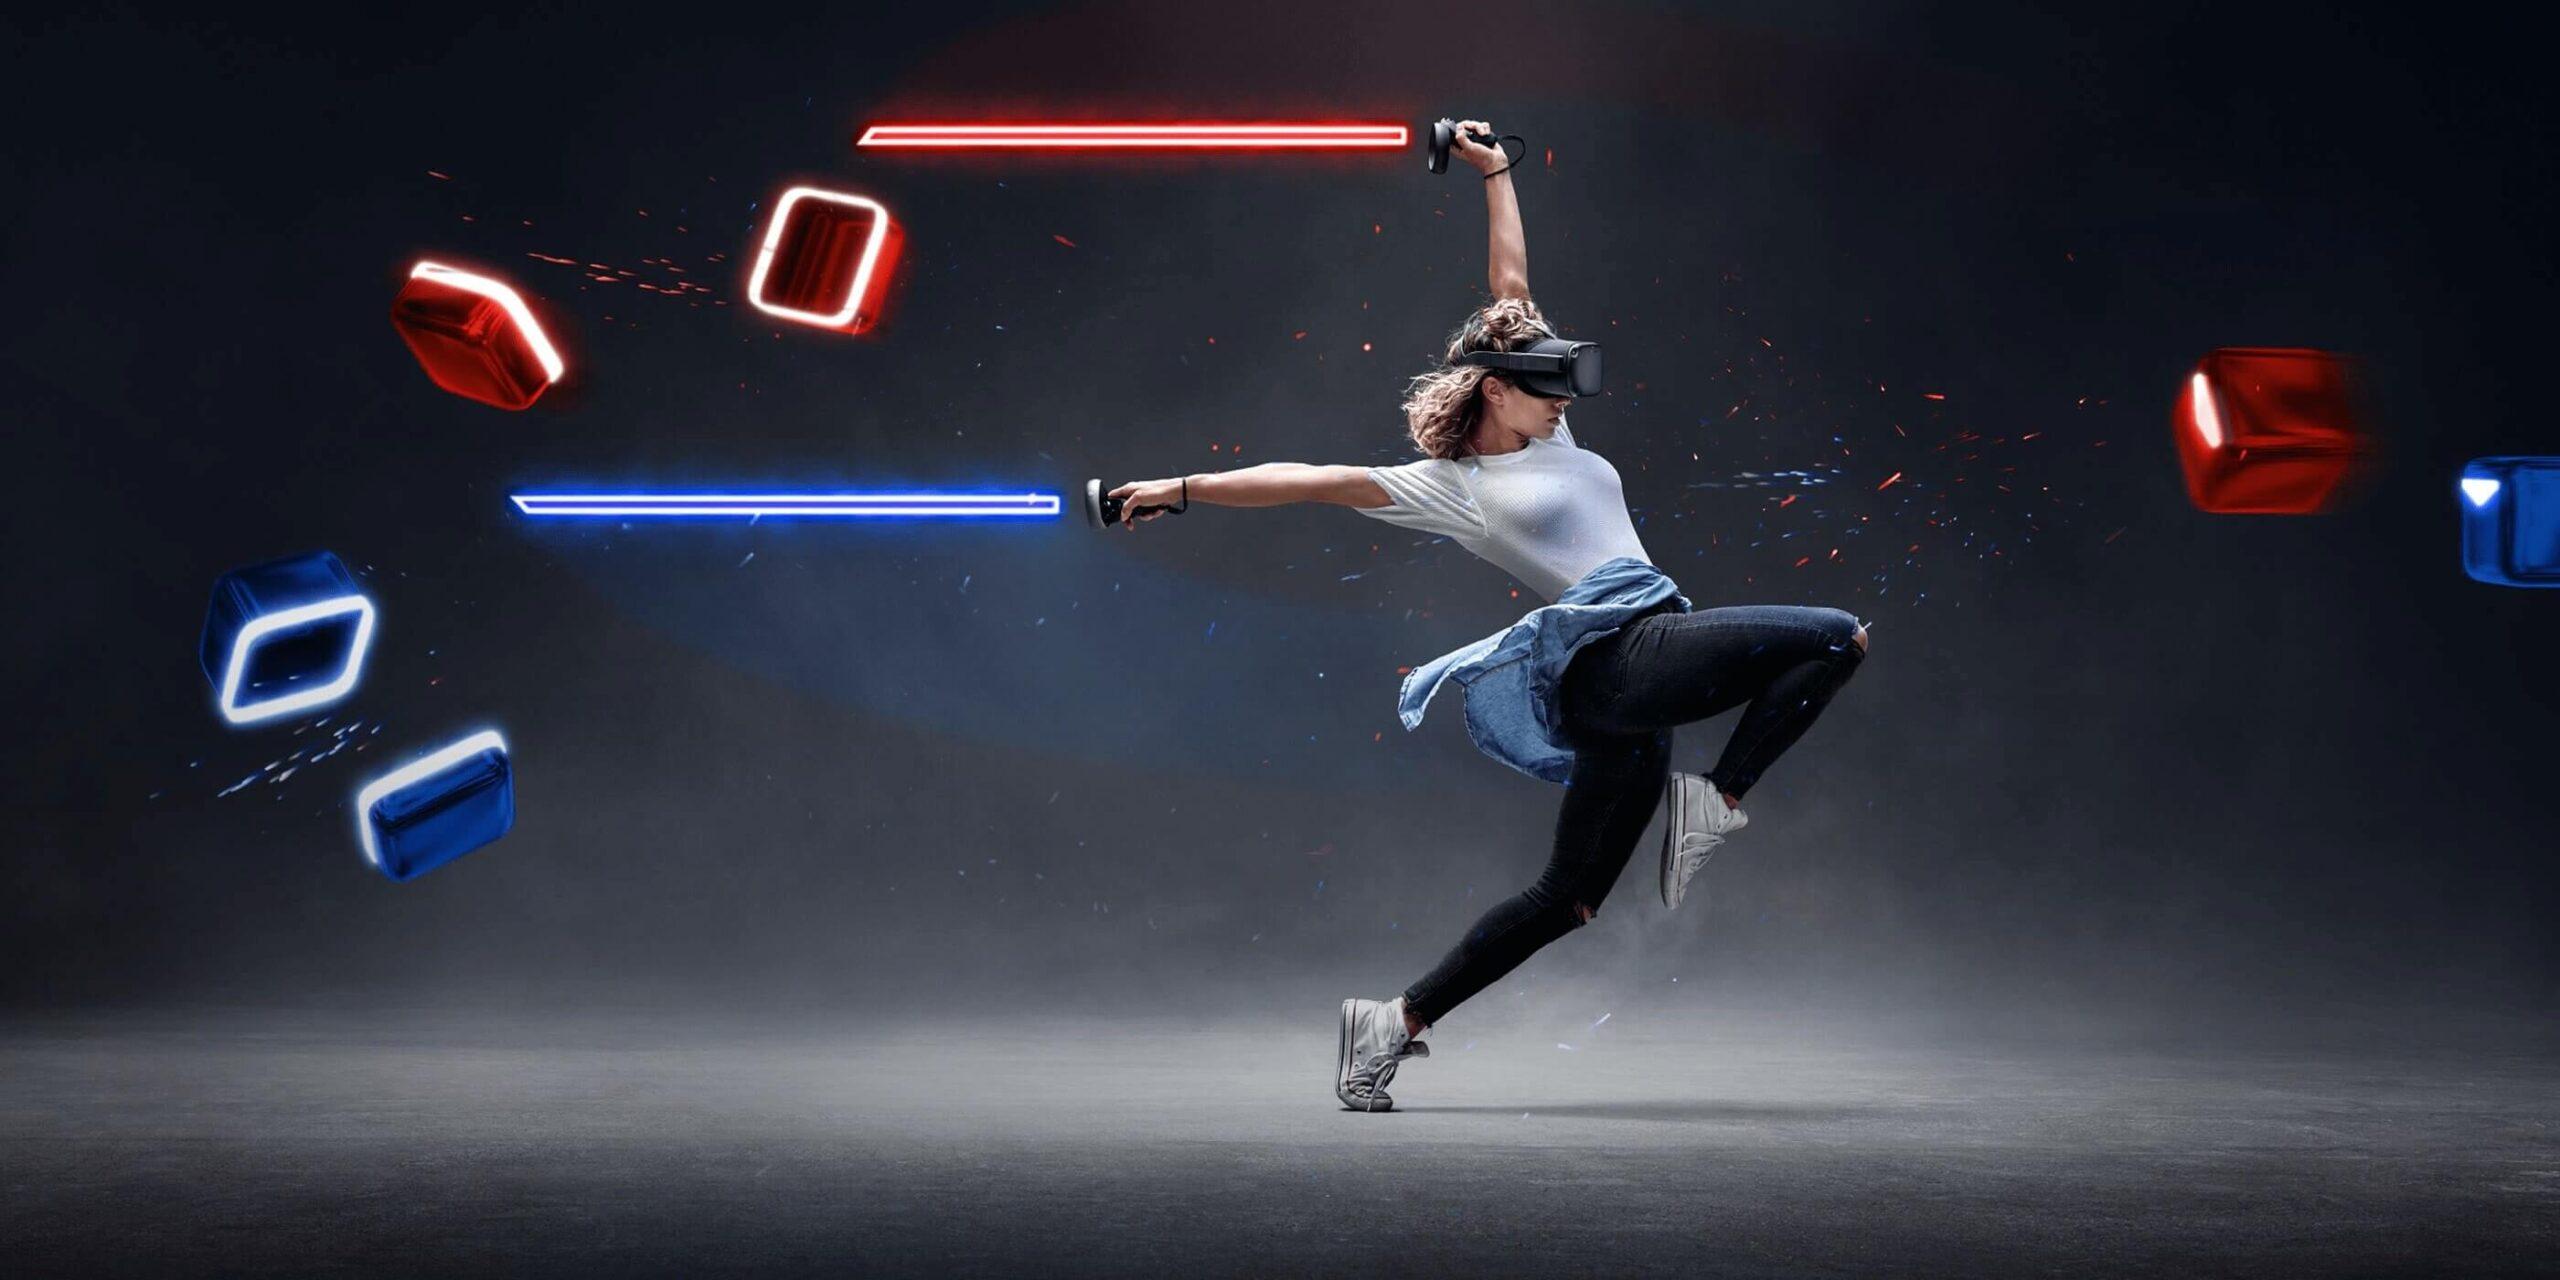 Best VR game